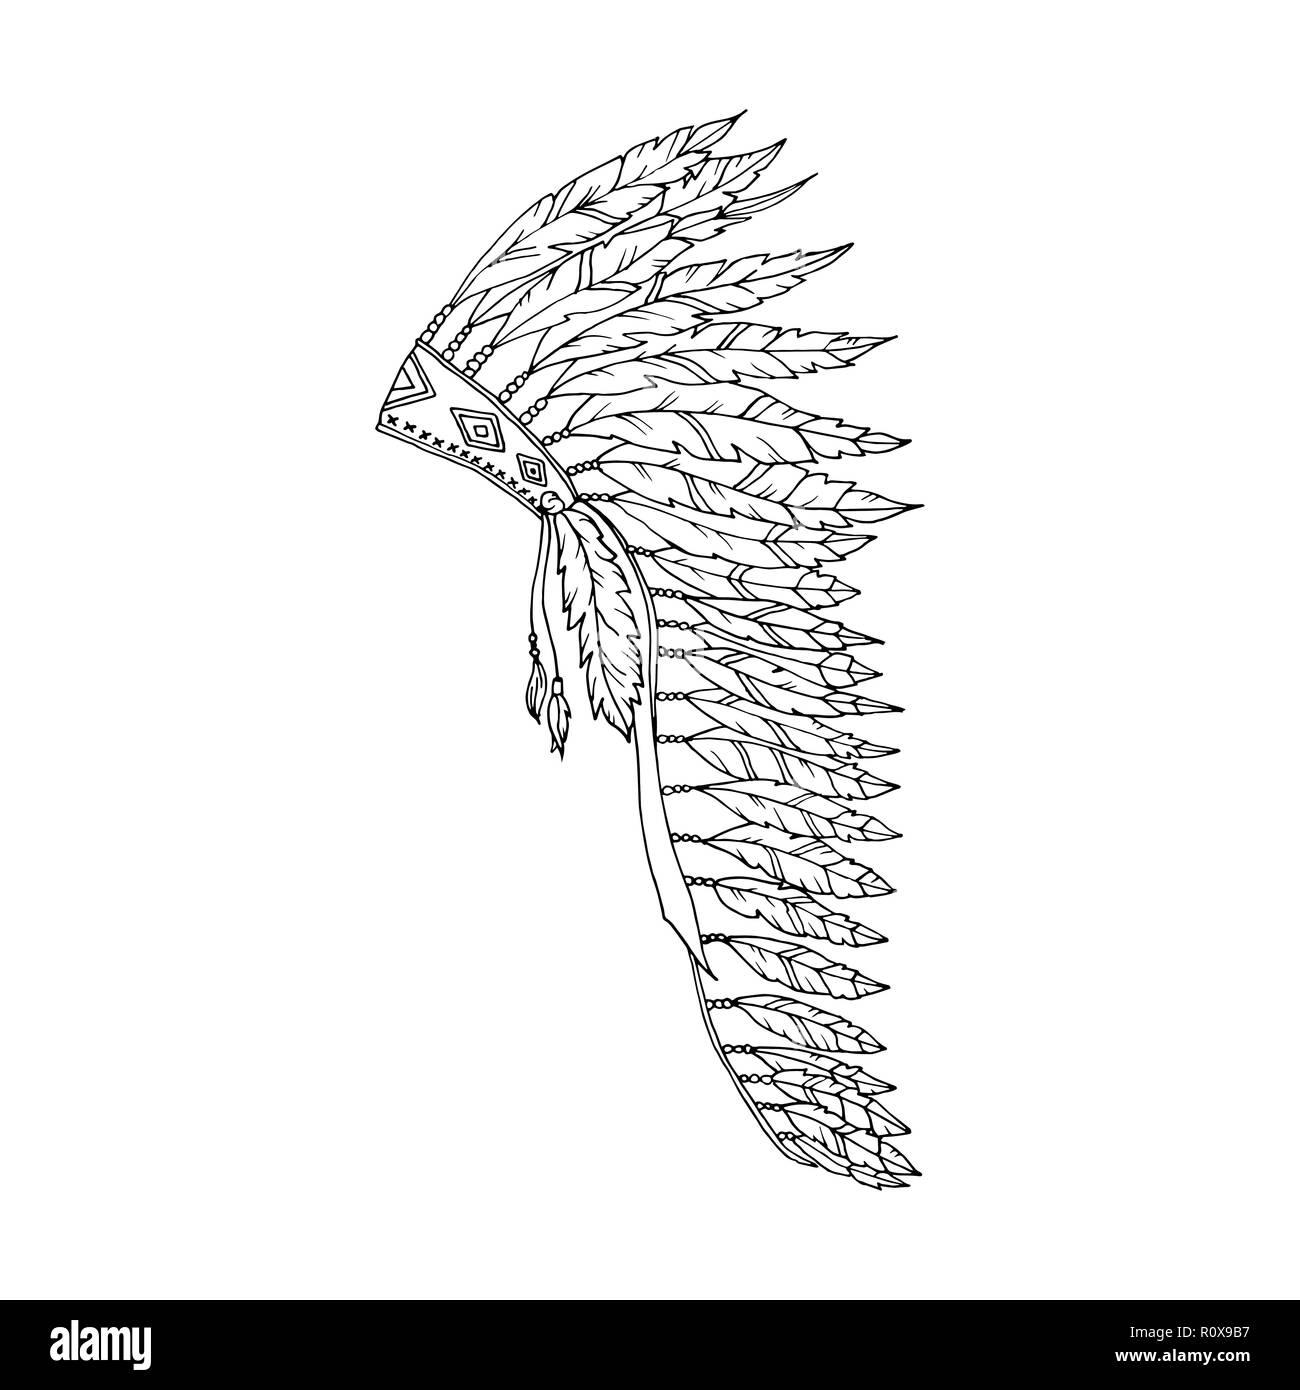 Coloring Feather Imágenes De Stock Coloring Feather Fotos De Stock